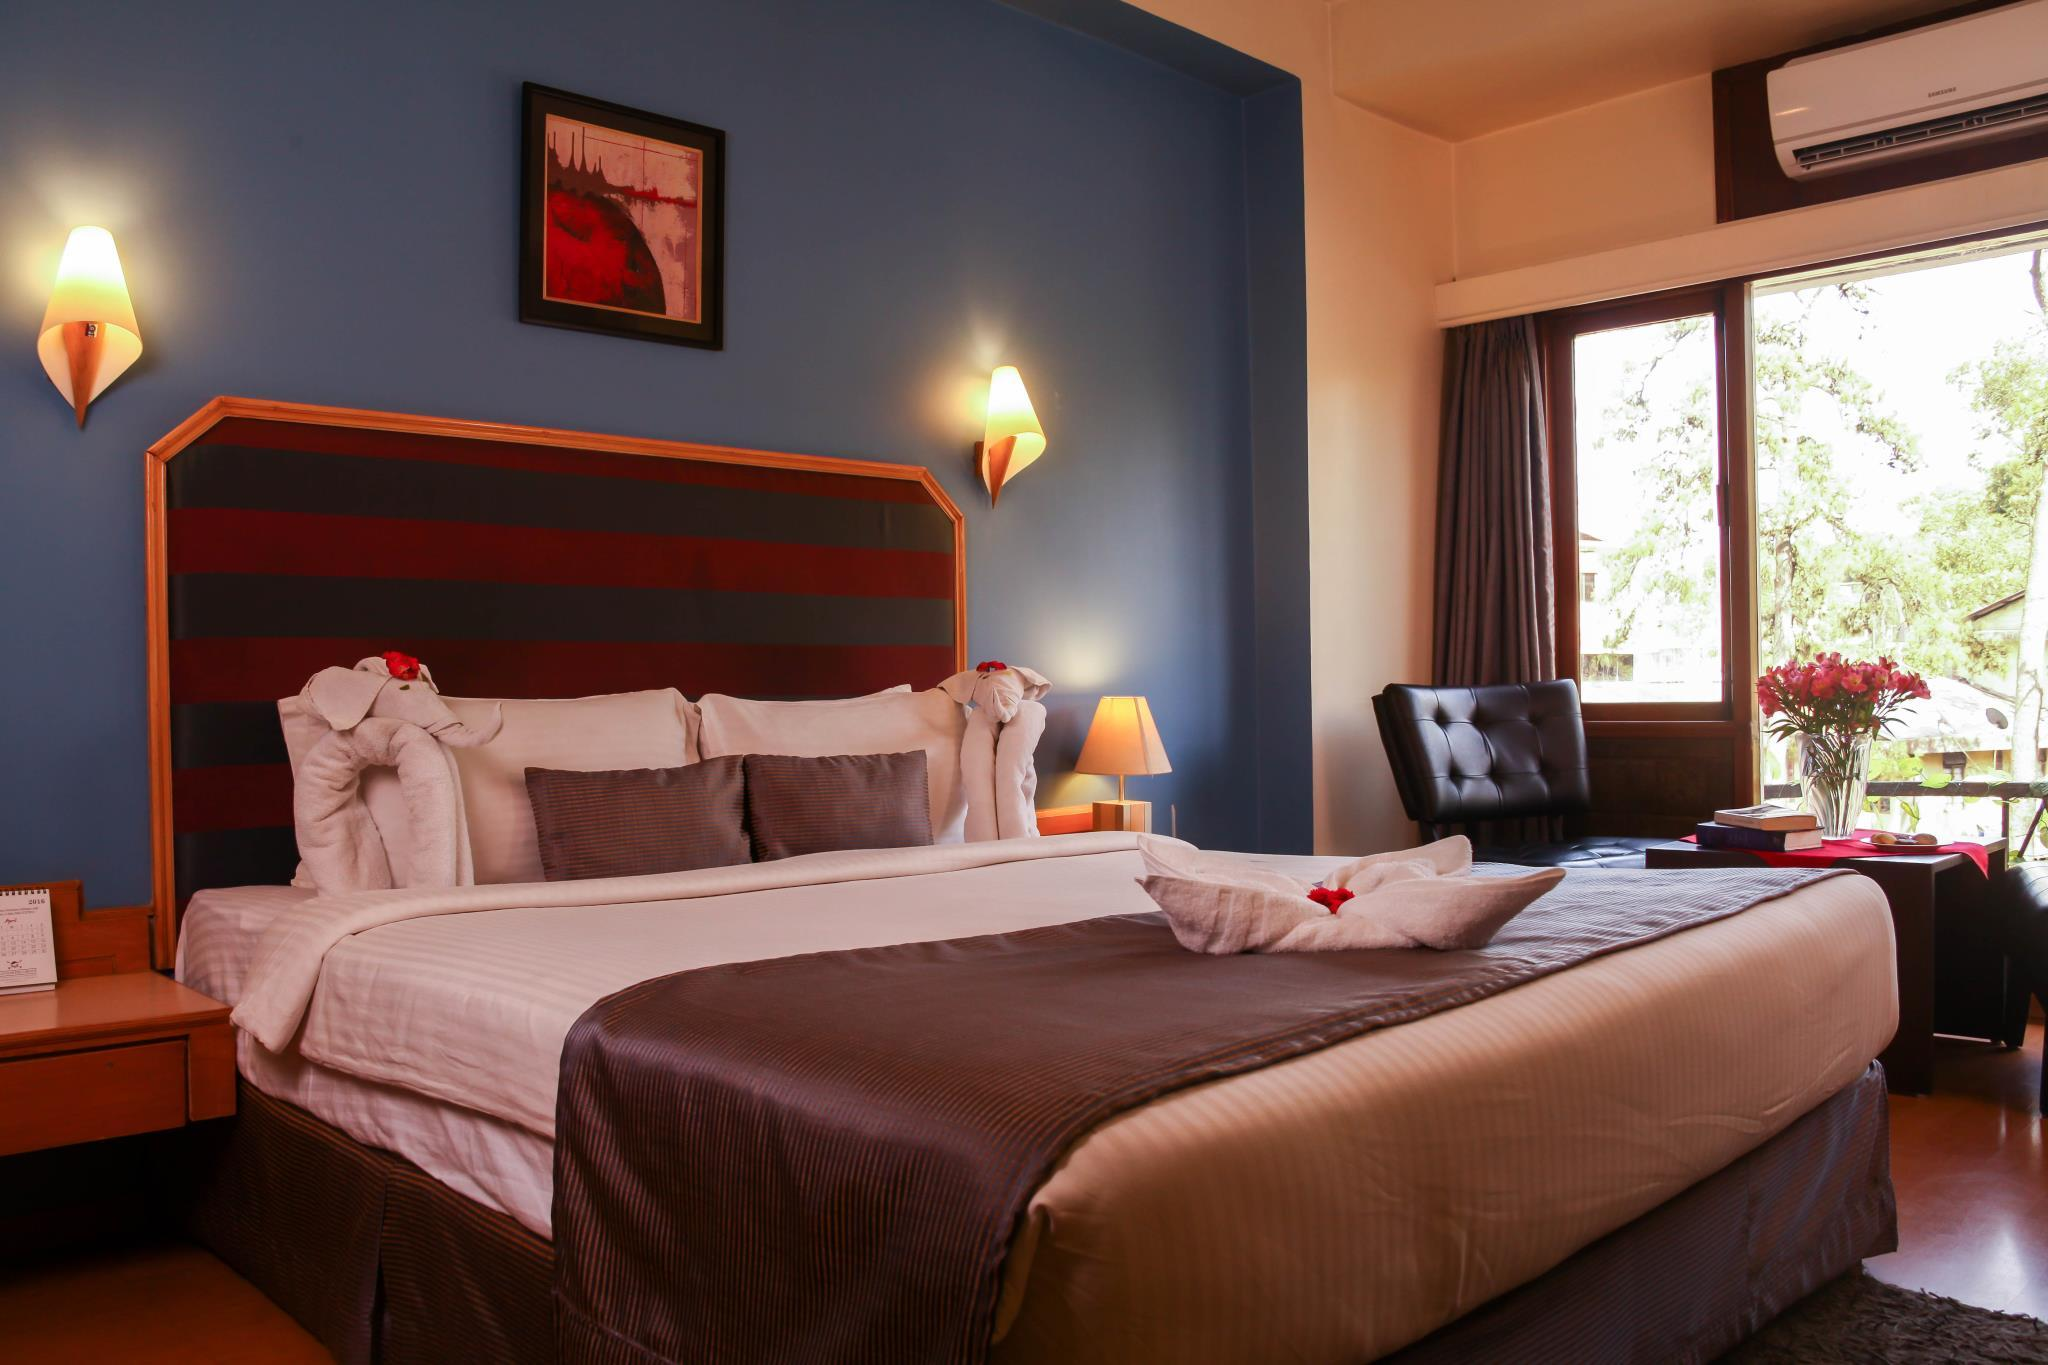 Mirage Two Bedroom Tower Suite Polo Towers 2 Bedroom Suite Custom Suites At The Jockey Club Las